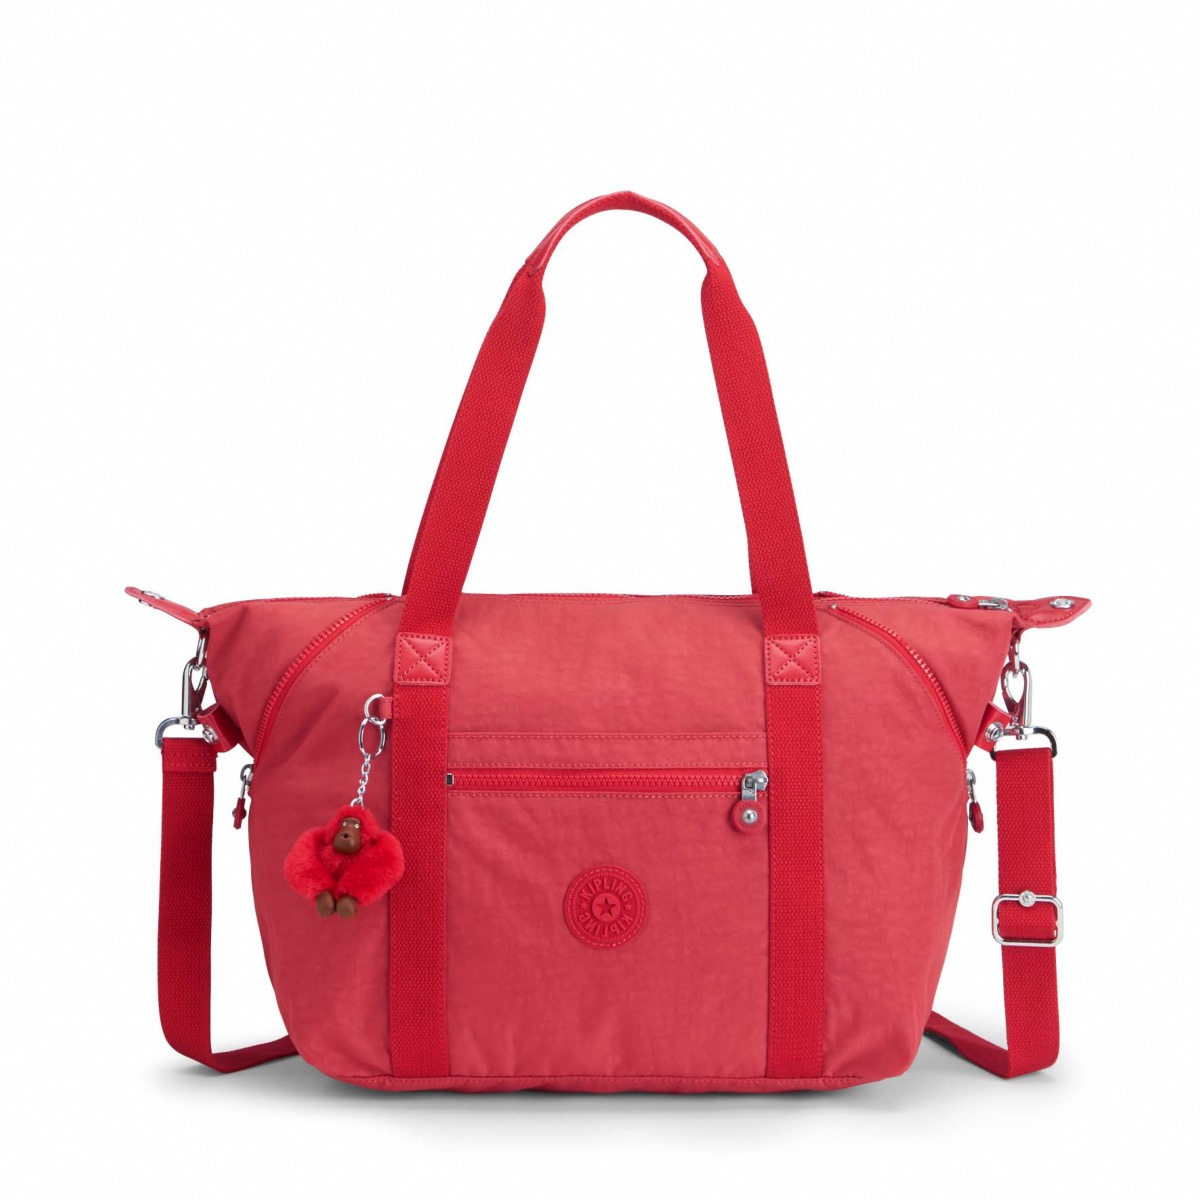 Art is a versatile handbag for women with a relaxed 4cb88c87486b2